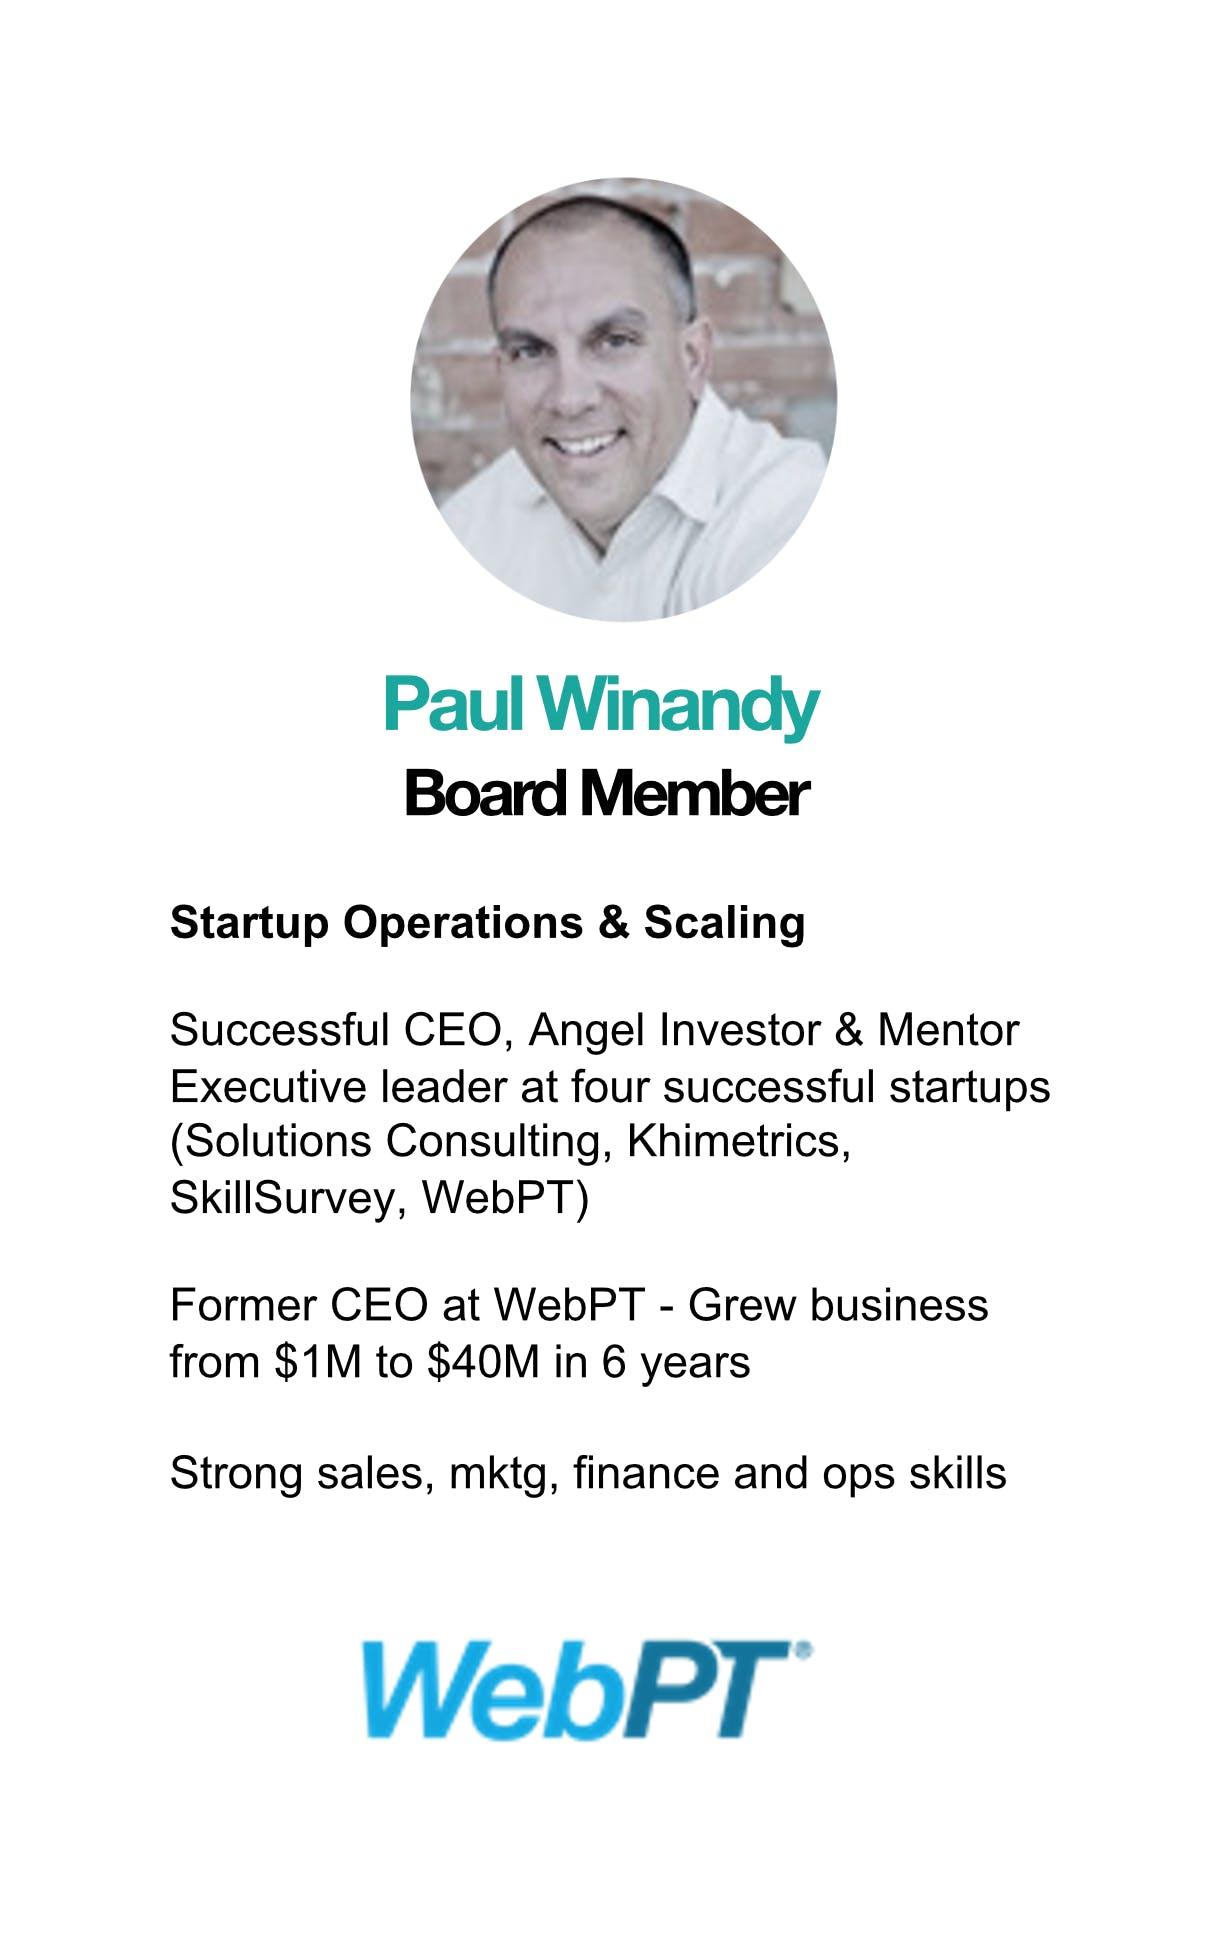 Paul Winandy WebPT CEO